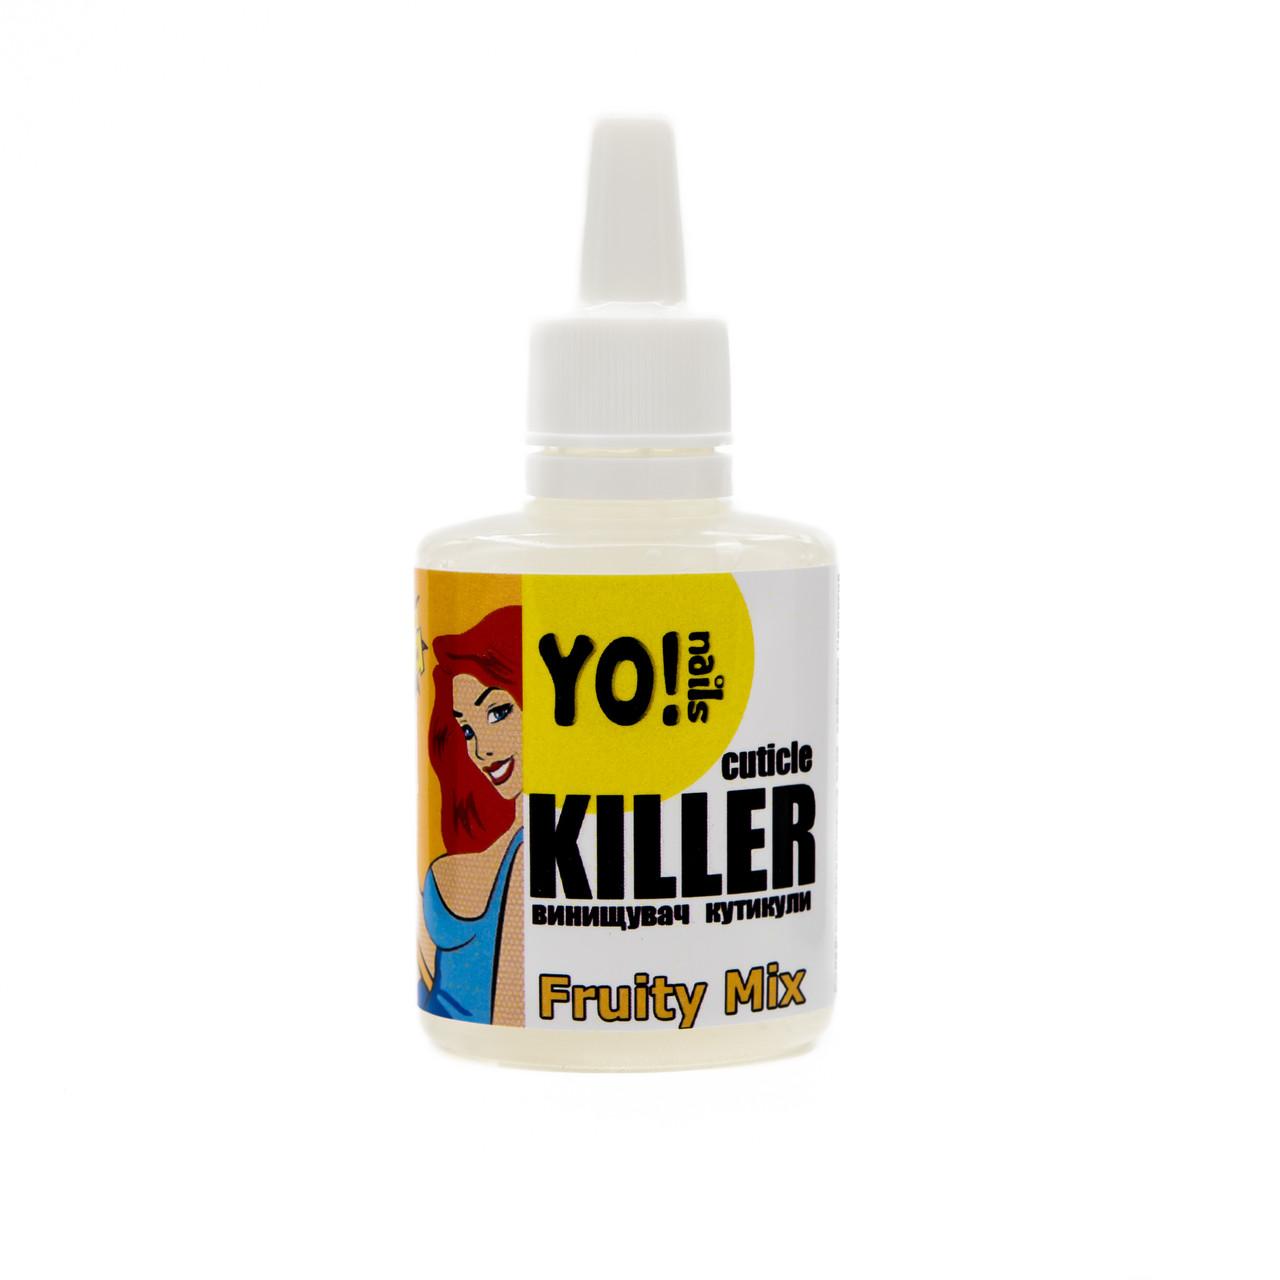 Ремувер для кутикулы,Yo!nails CUTICLE KILLER Fruity Mix